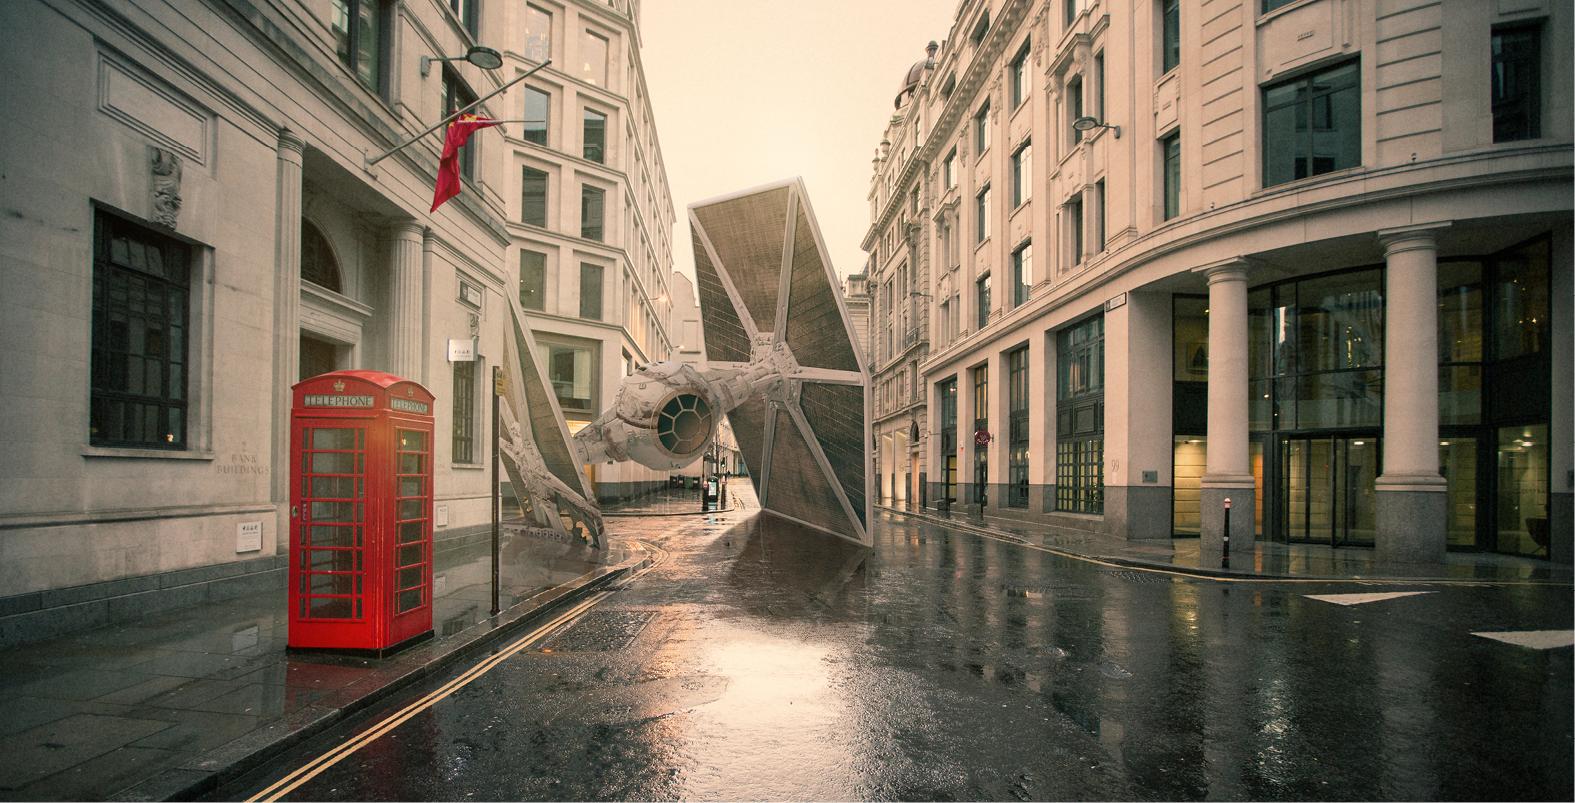 STAR WARS - LONDON